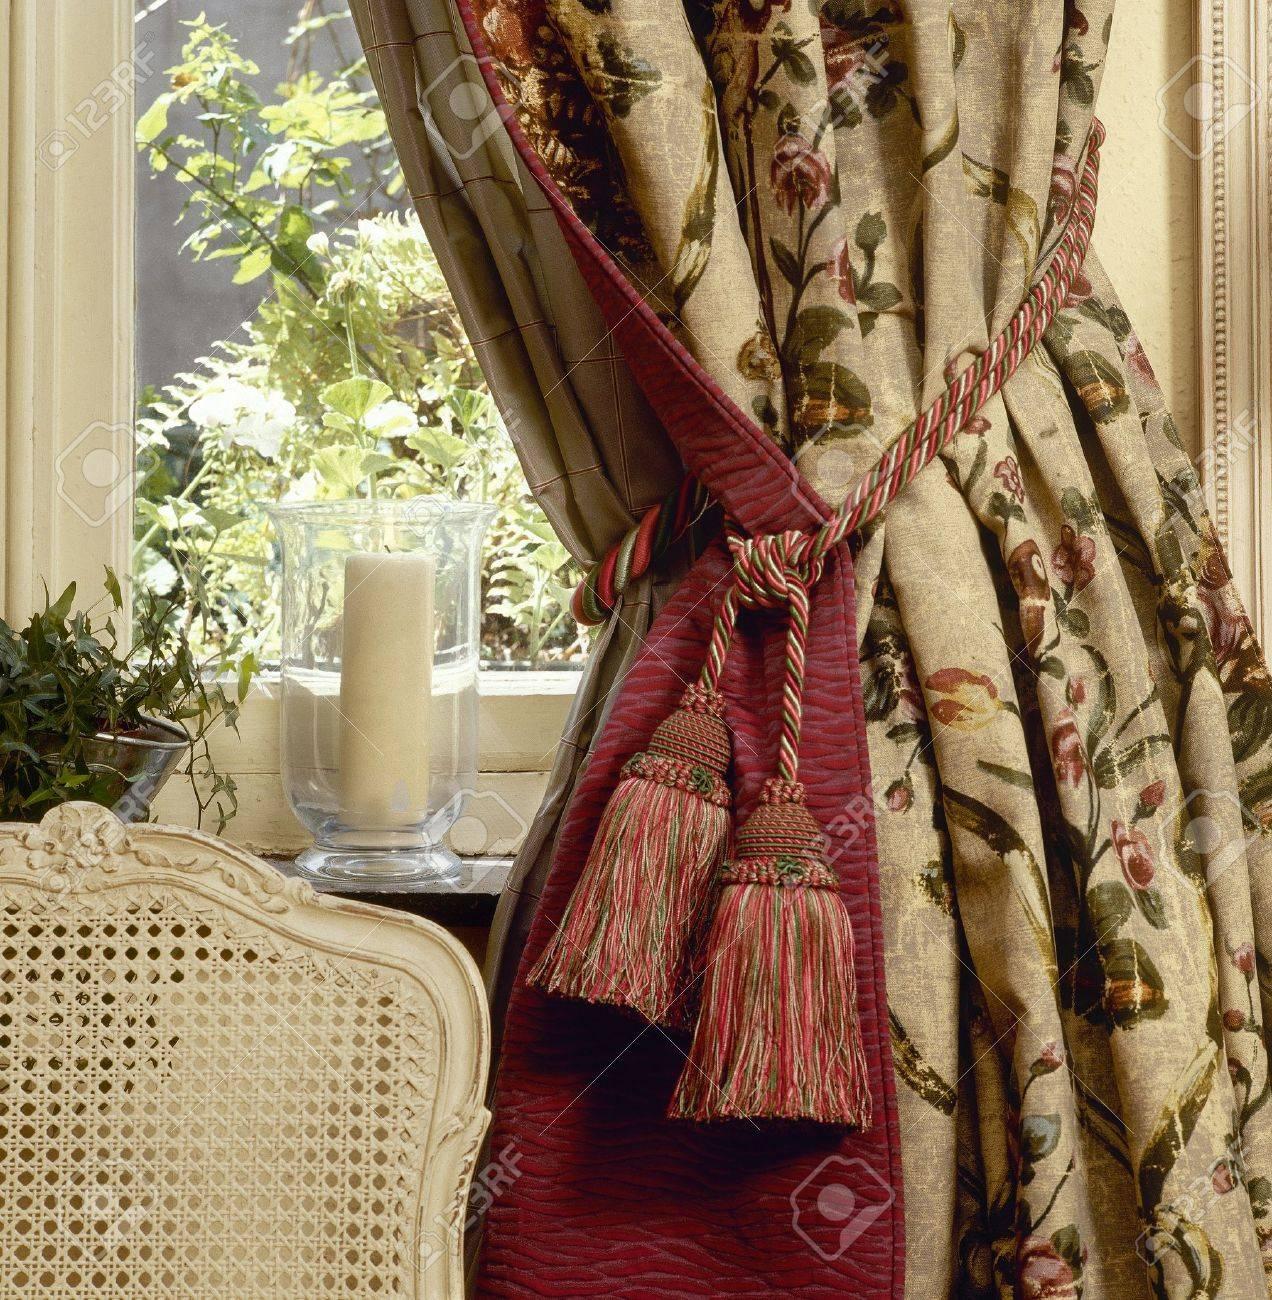 Elegant curtain and window Standard-Bild - 15847499